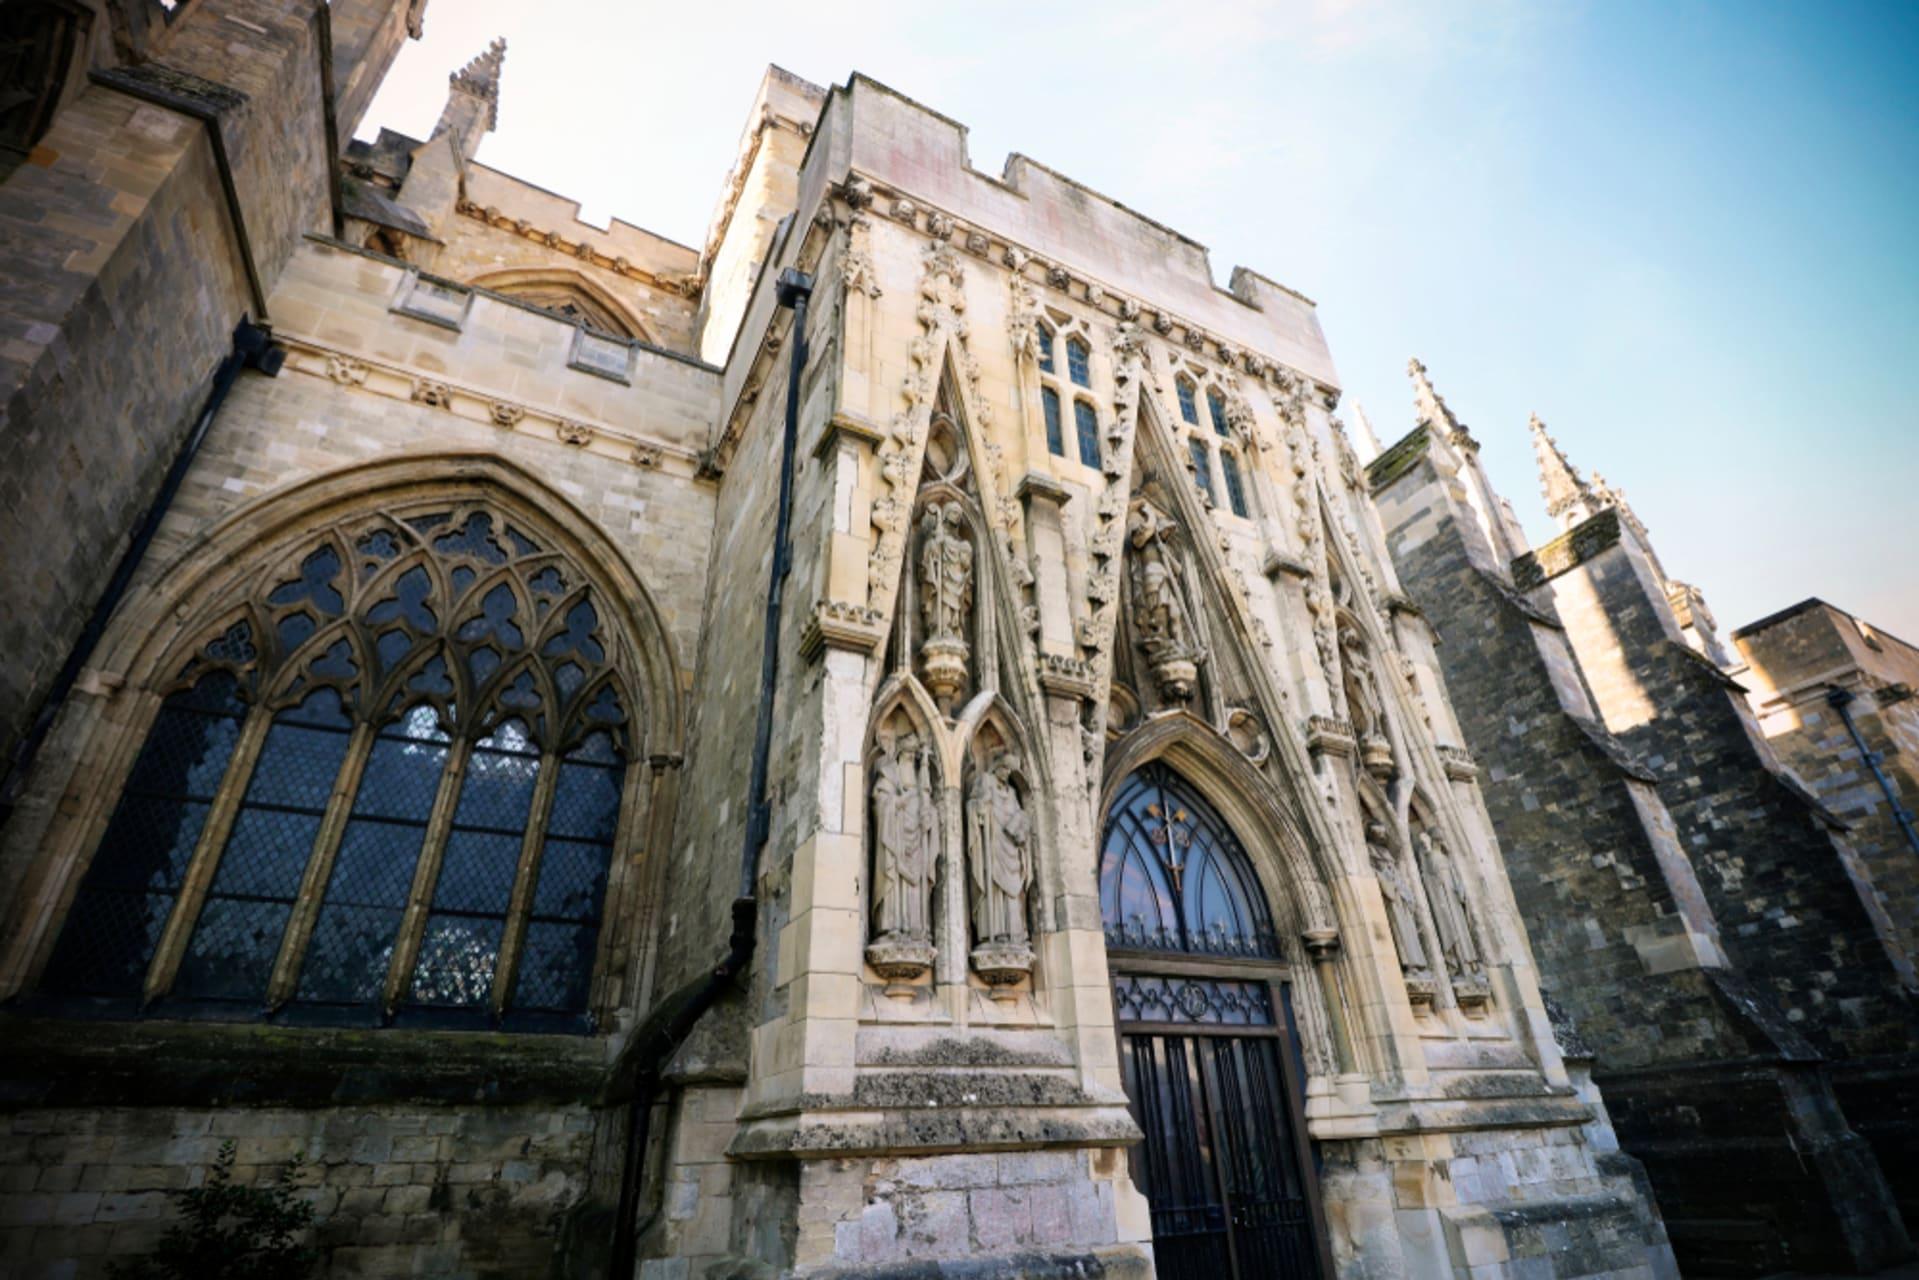 Devon - Exeter: Roman, Medieval, and Modern (Silent Tour)